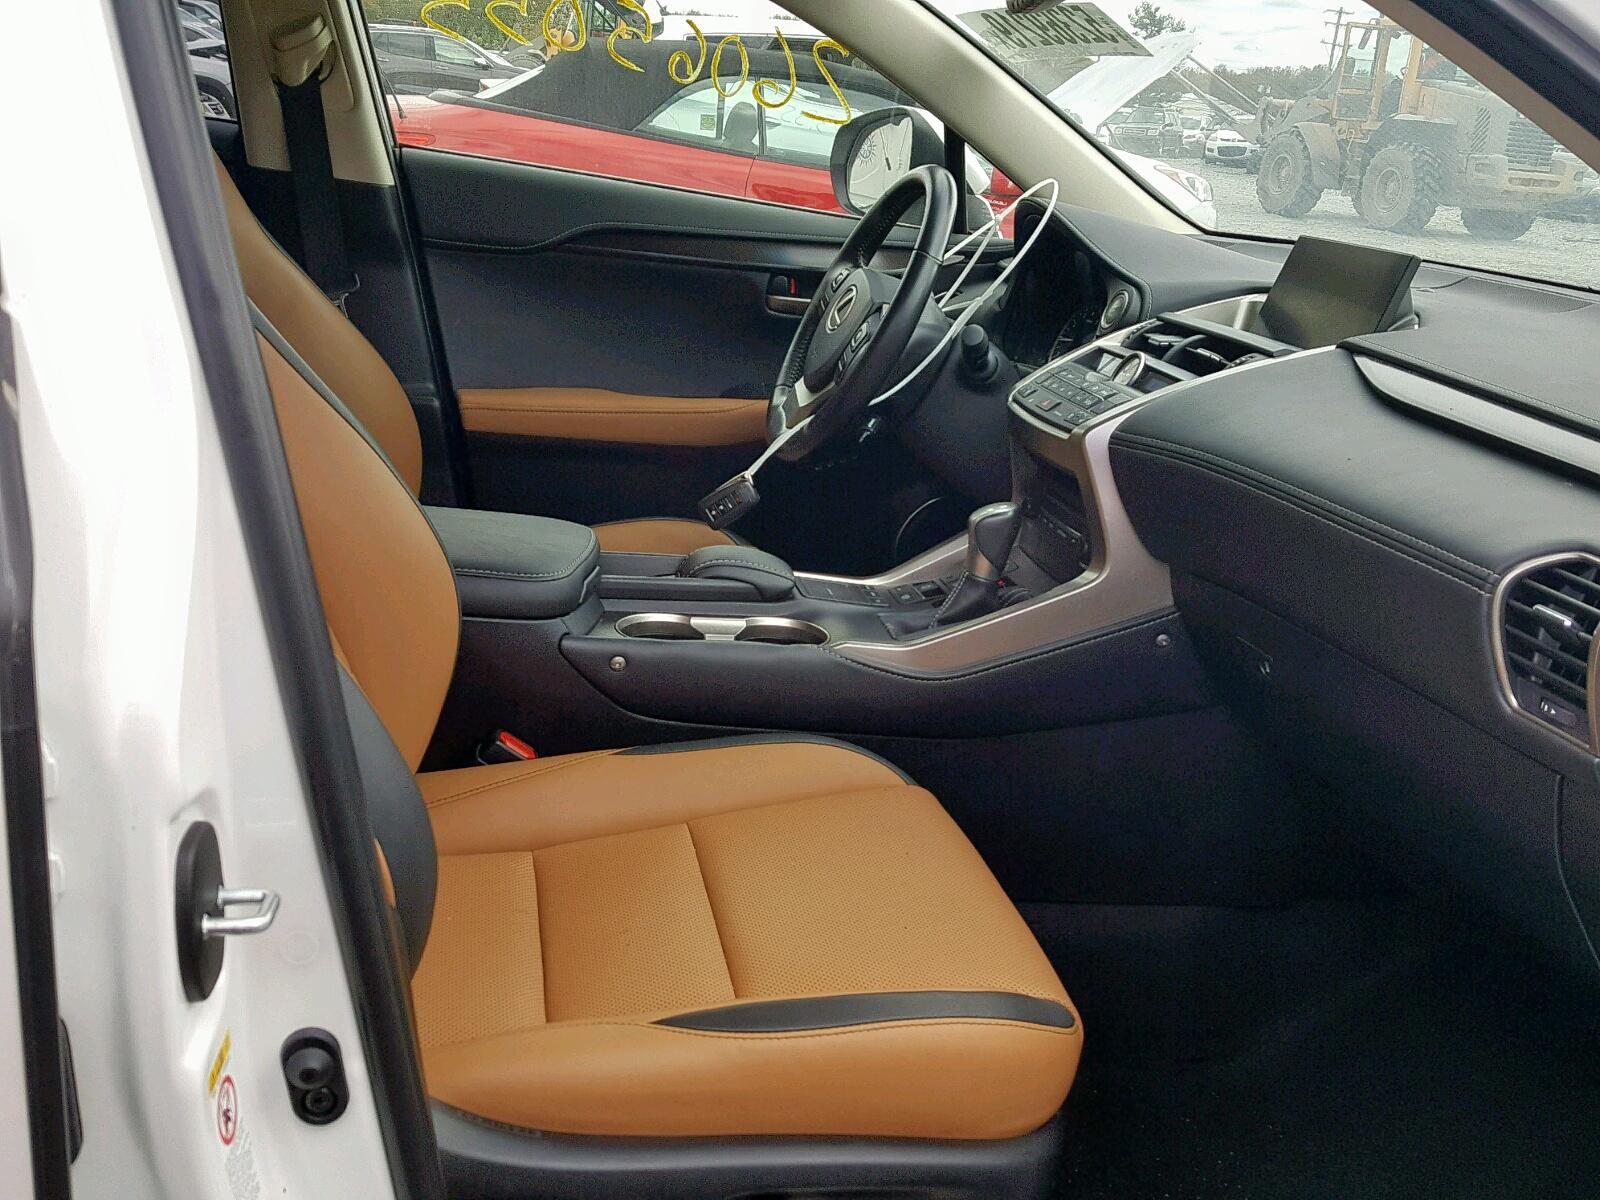 JTJBARBZ0H2096456 - 2017 Lexus Nx 200T Ba 2.0L close up View